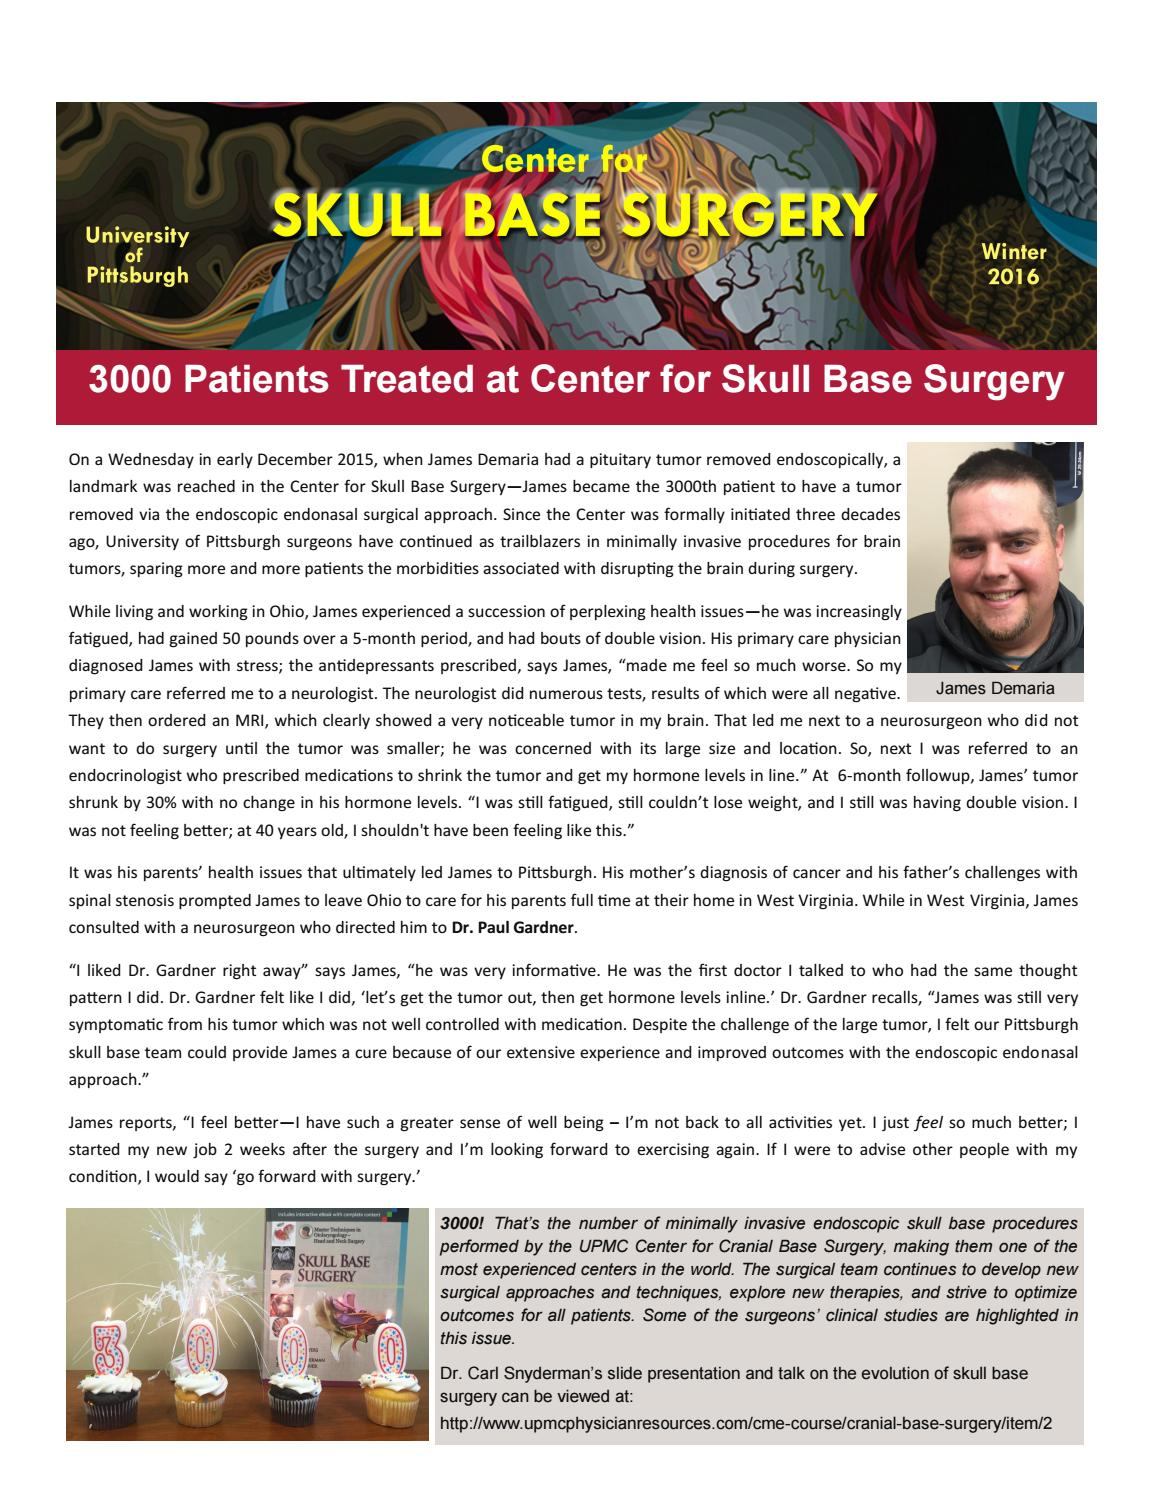 Center for Skull Base Surgery: Winter 2016 by Eye & Ear Foundation